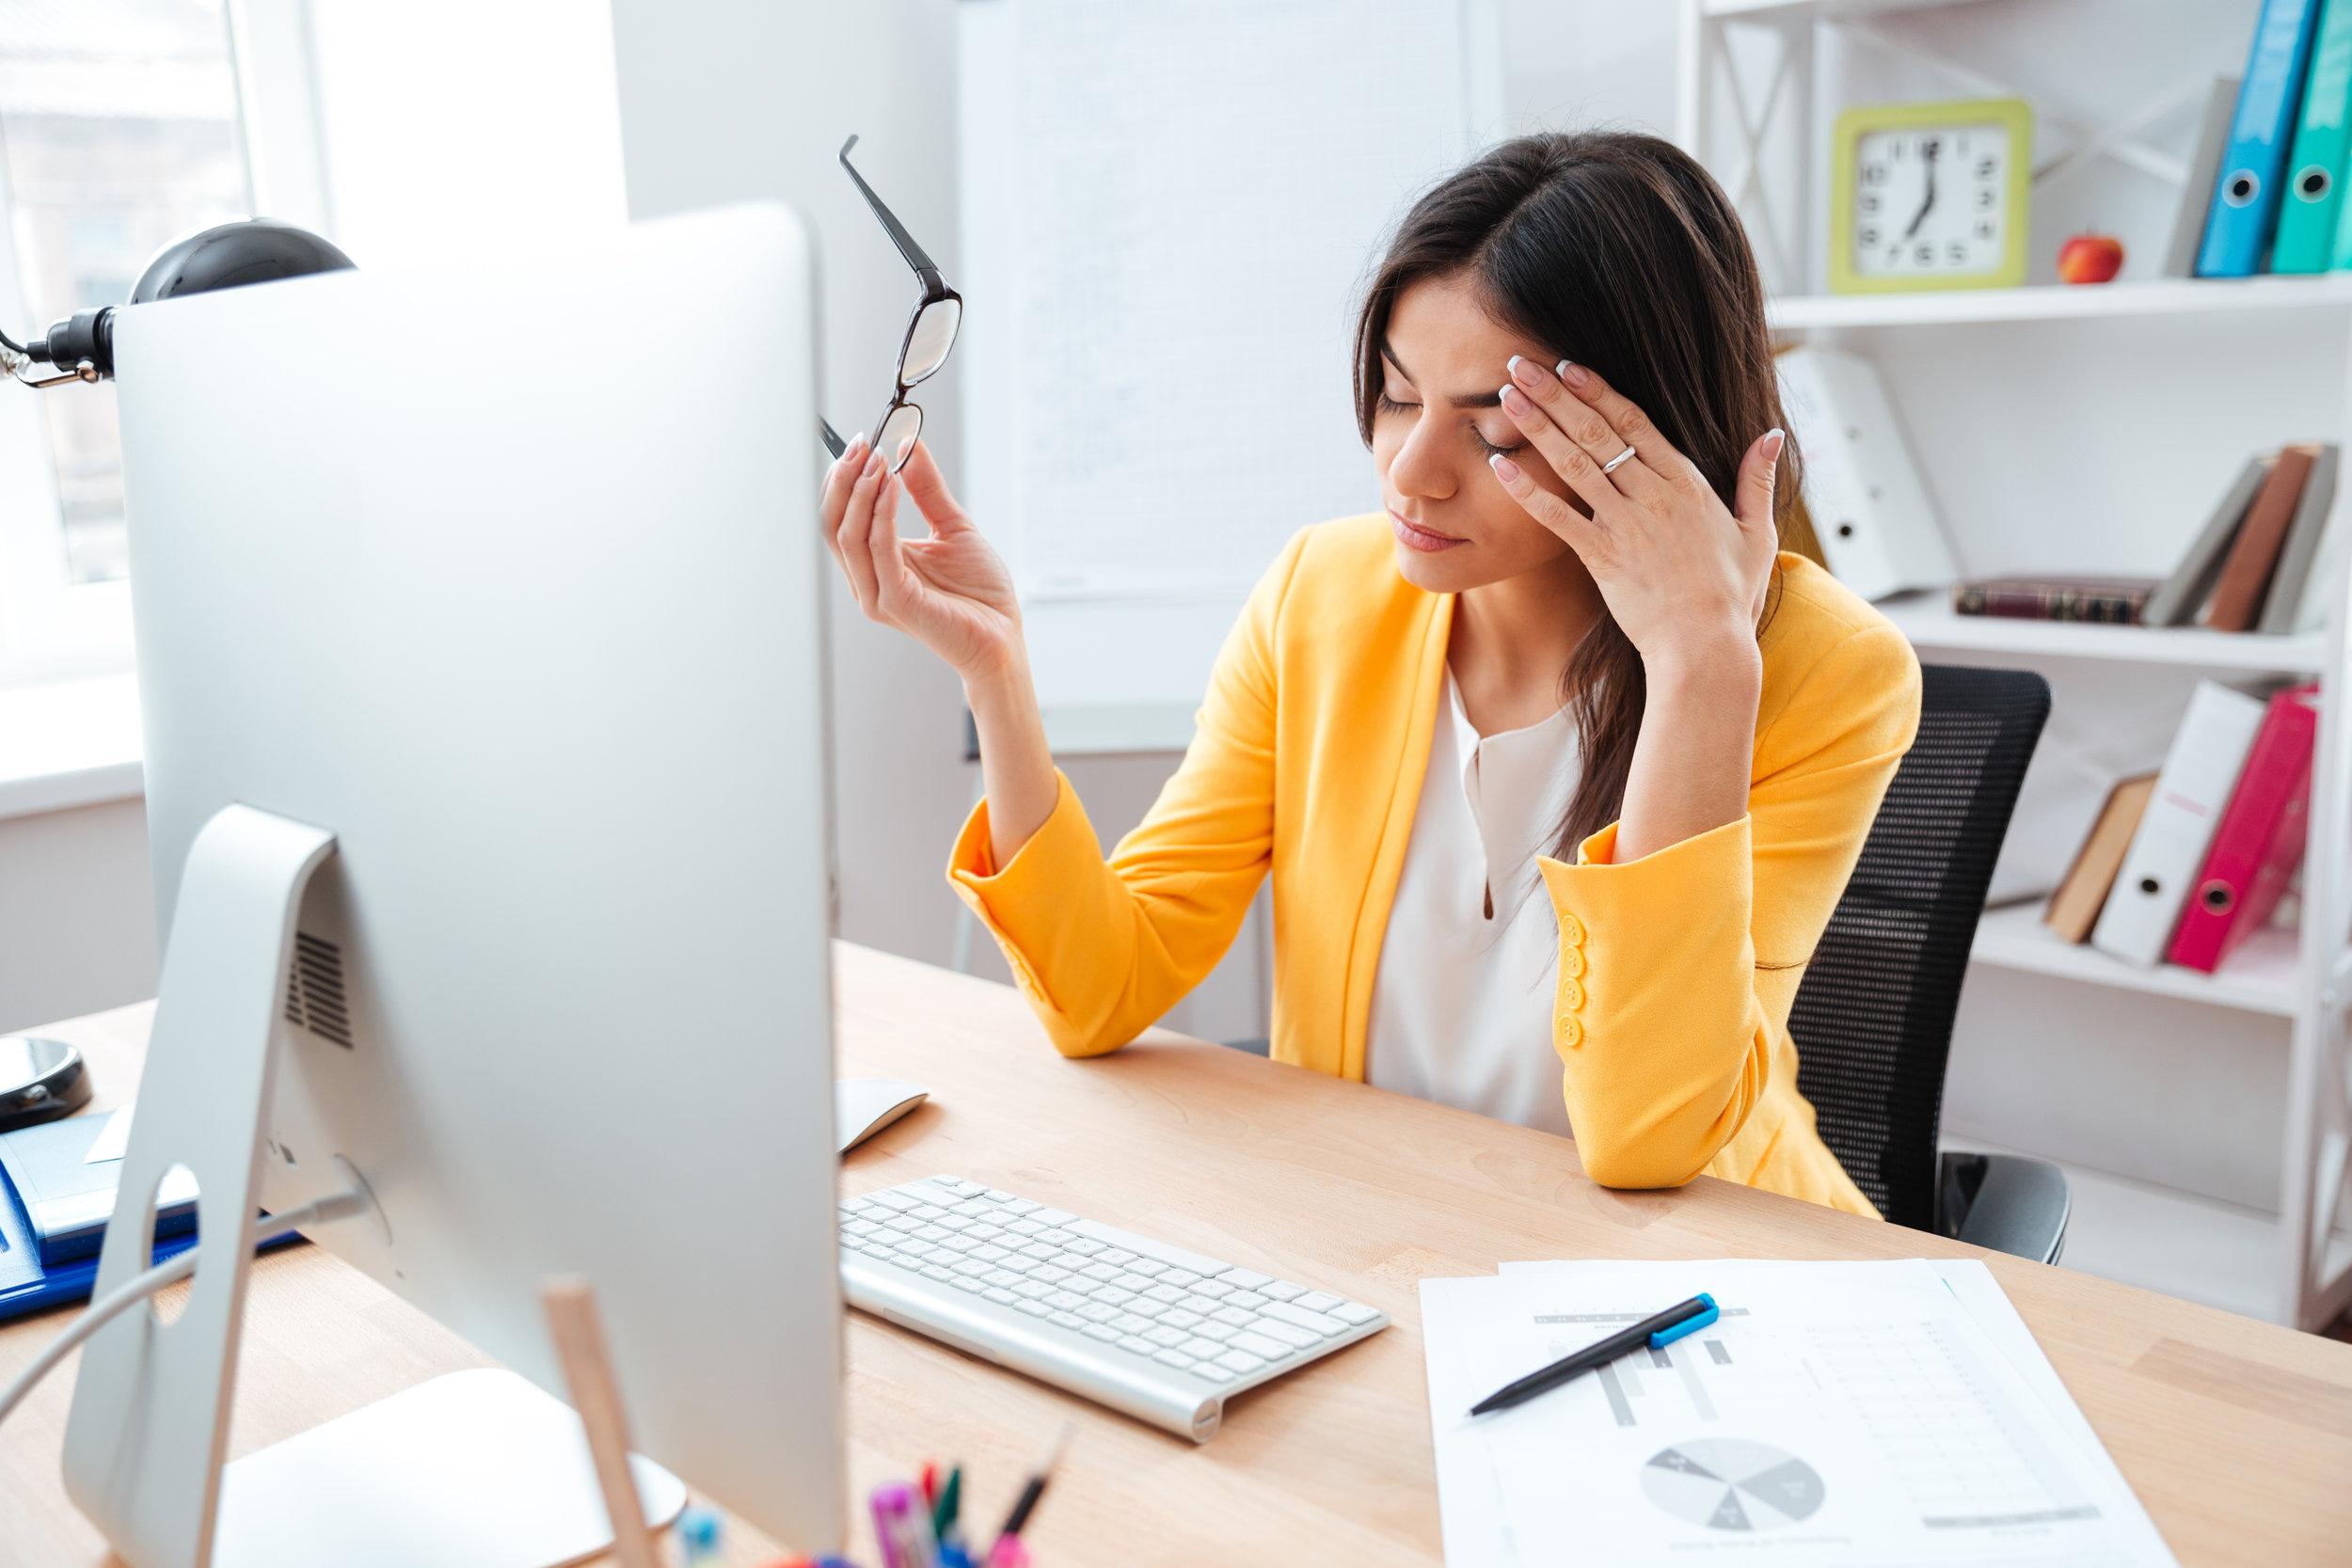 businesswoman-having-head-pain-PYQ8FP6.jpg